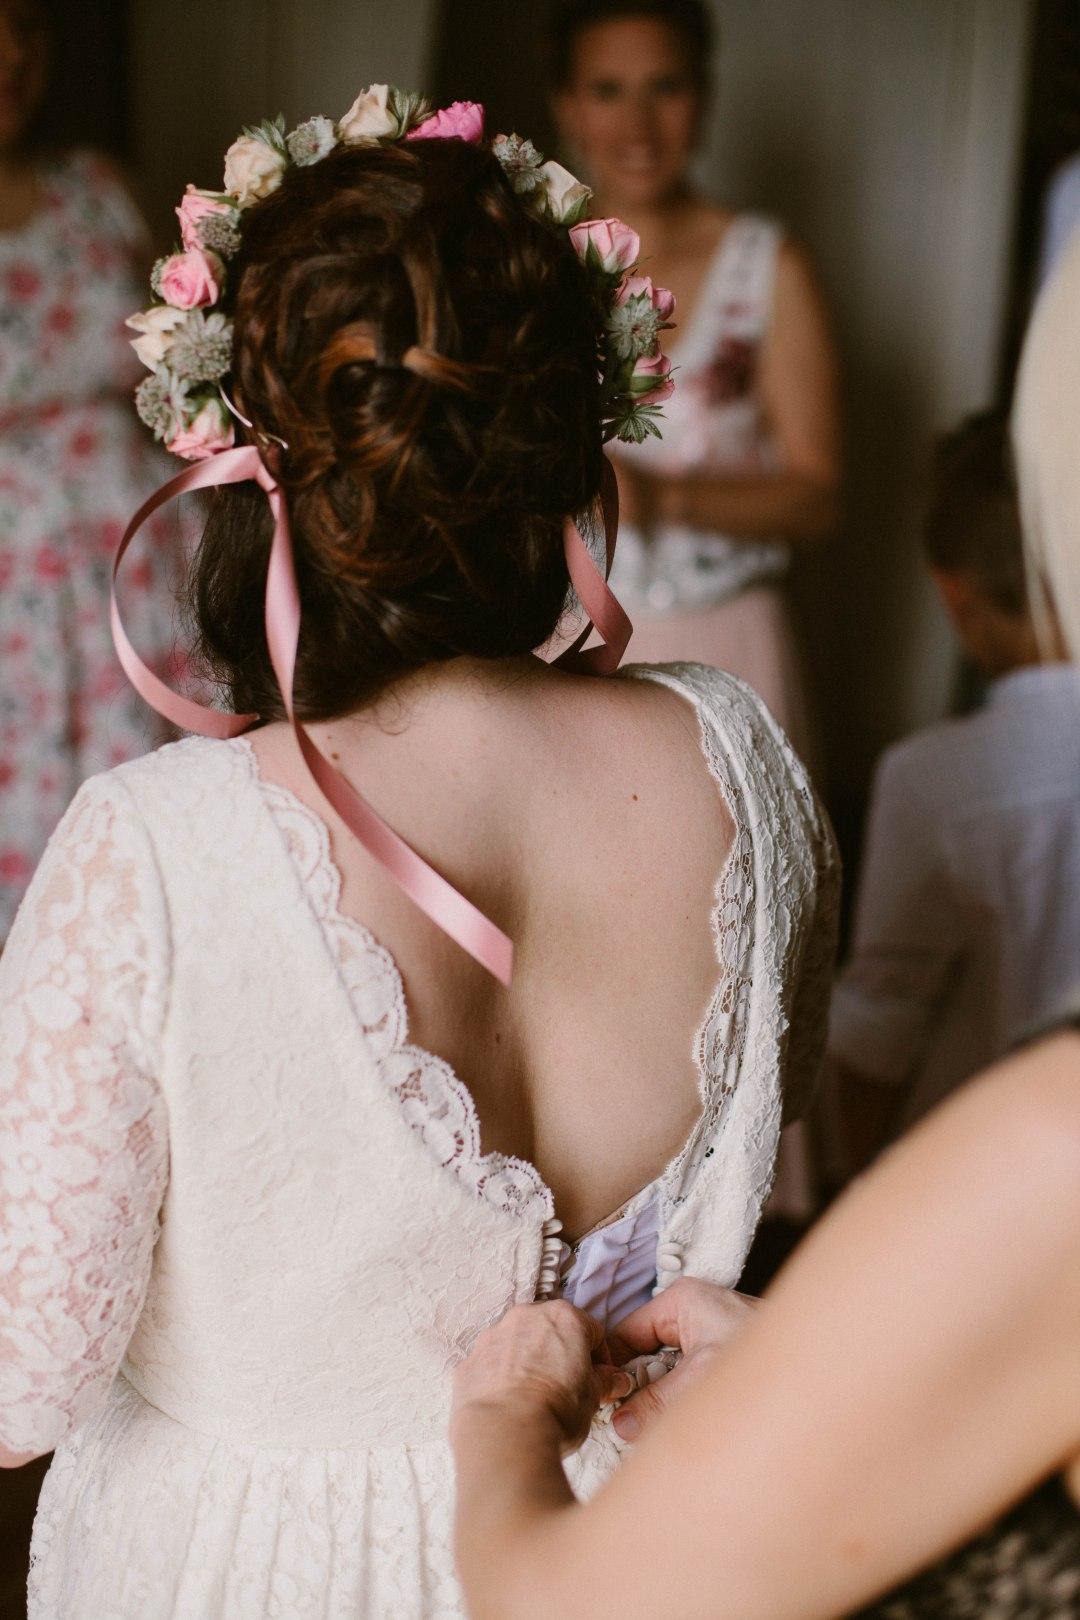 mariee-couronne-fleurs-mariage